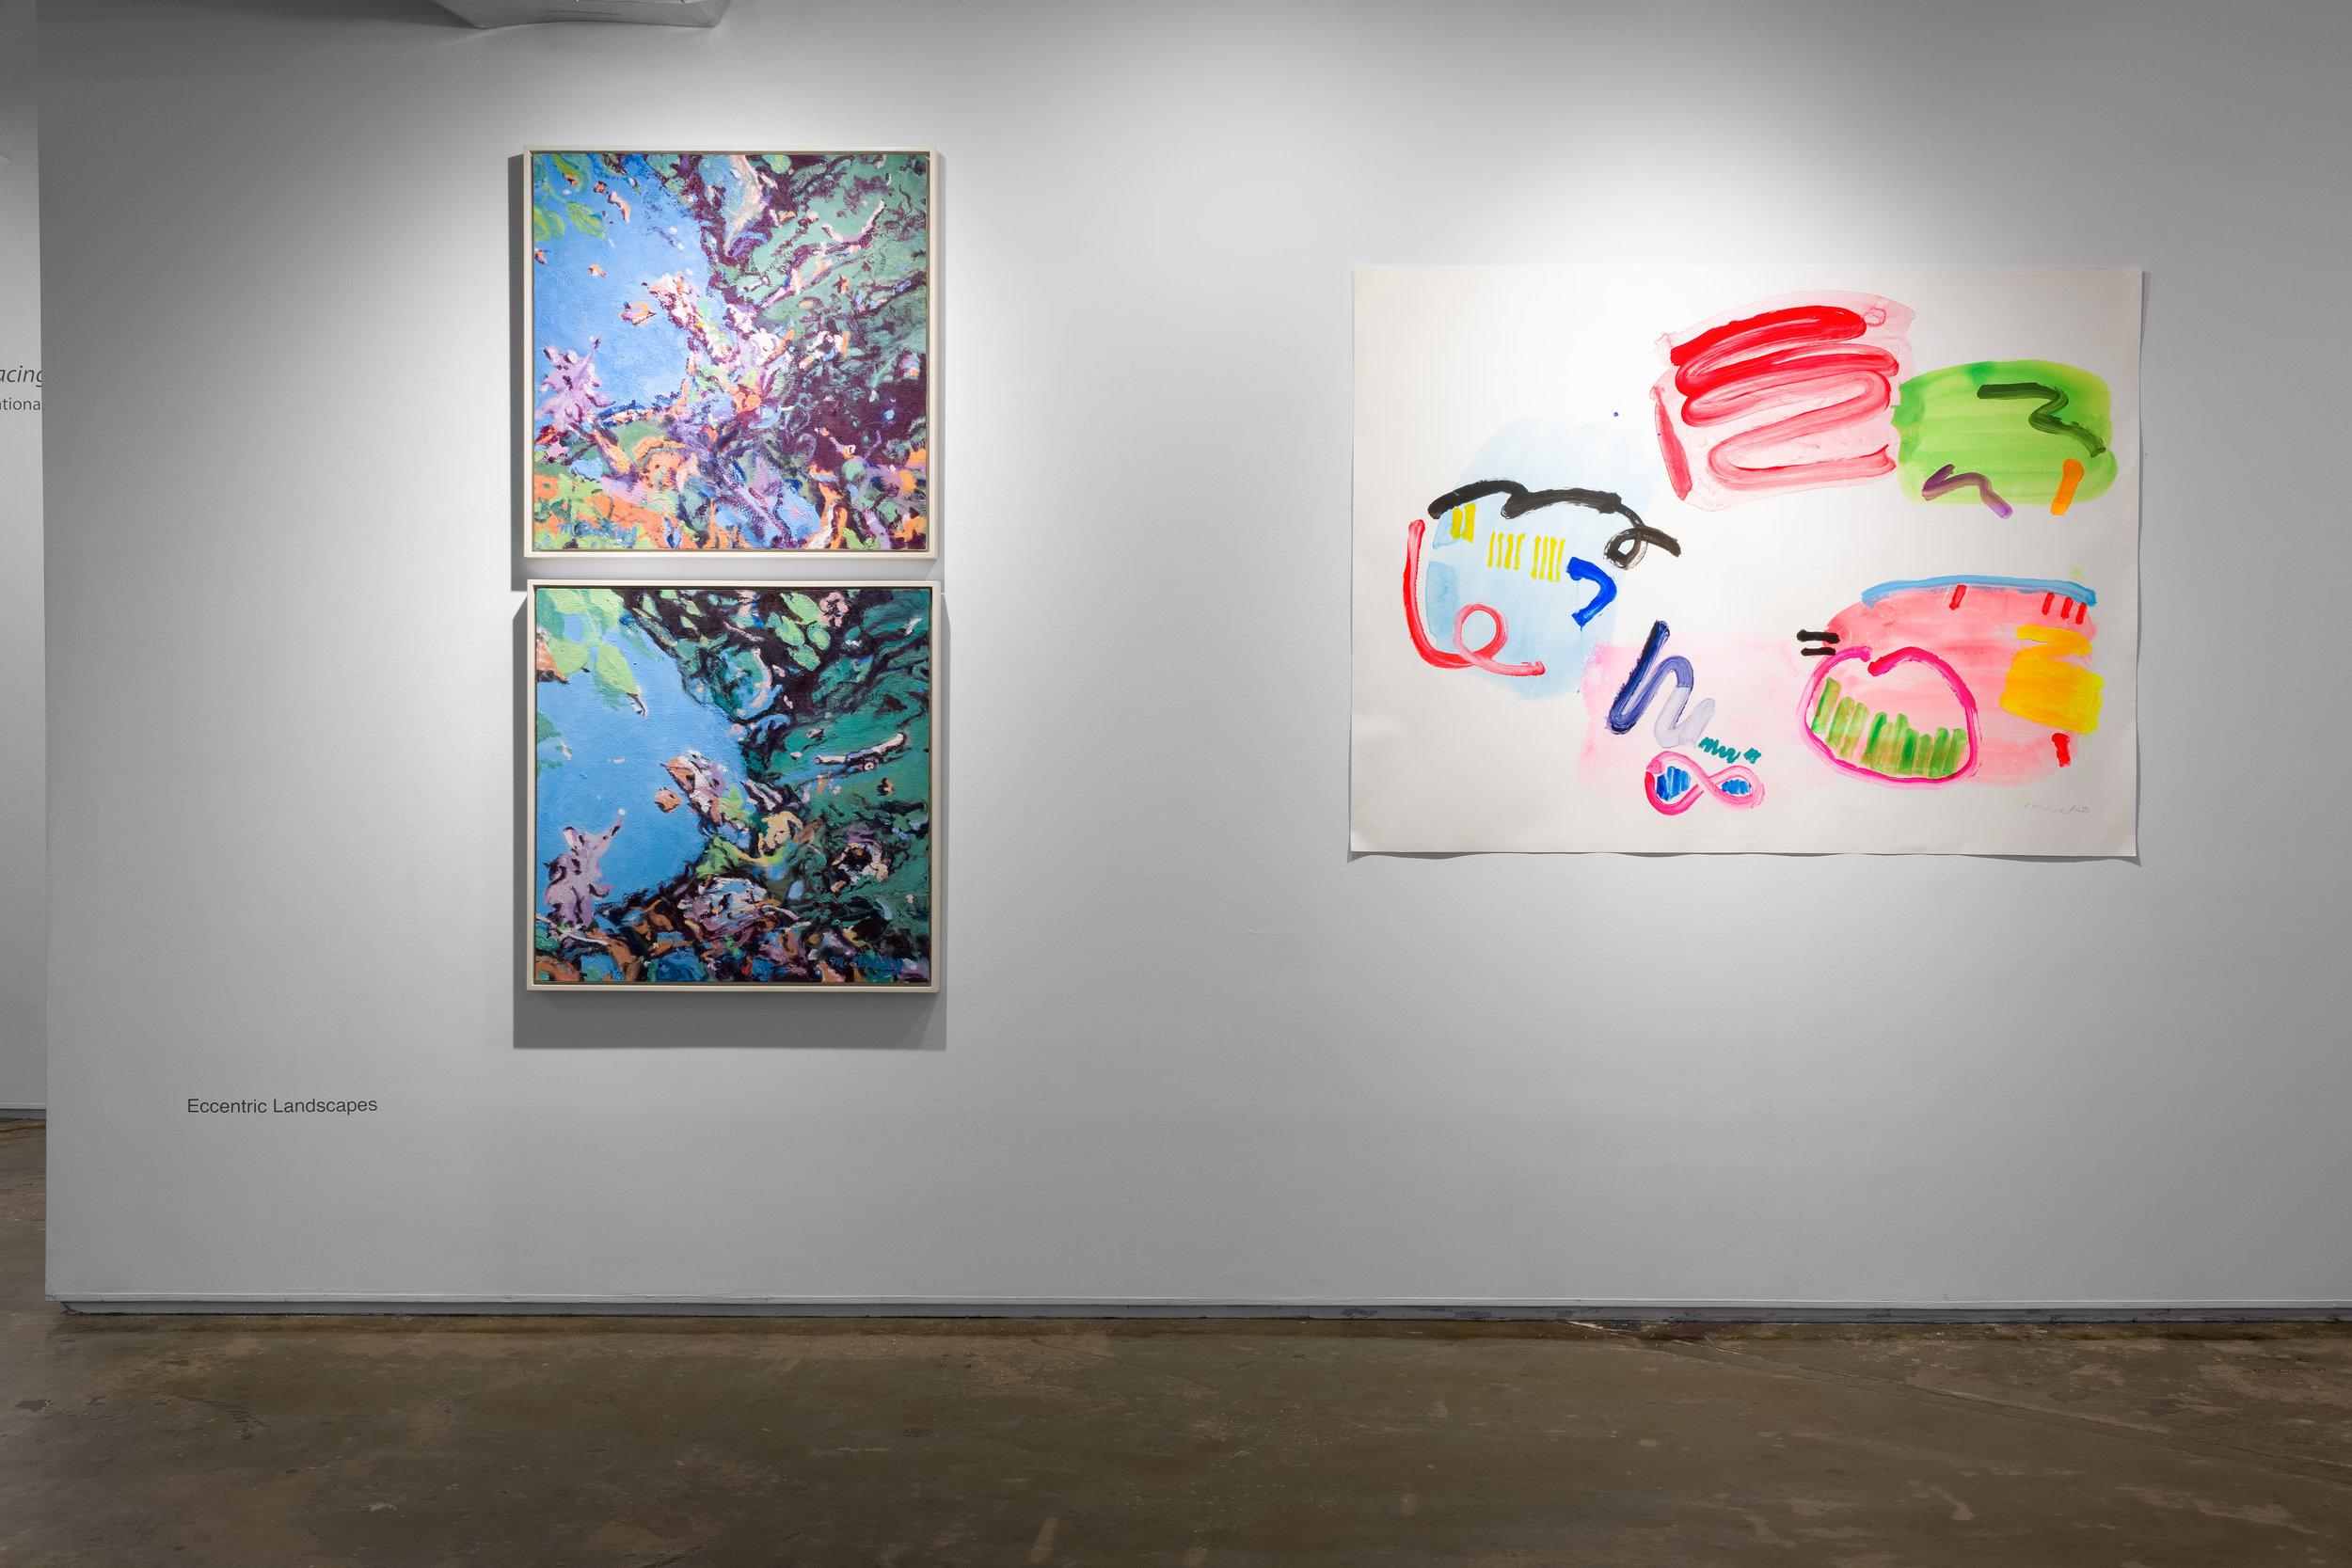 Left: Mimi Oritsky,  The Bright #14  and  The Bright #13 , 2017. Oil on canvas  Right: Mineko Yoshida,  Kinder Drawing No. 8 , 2016. Acrylic on Yupo